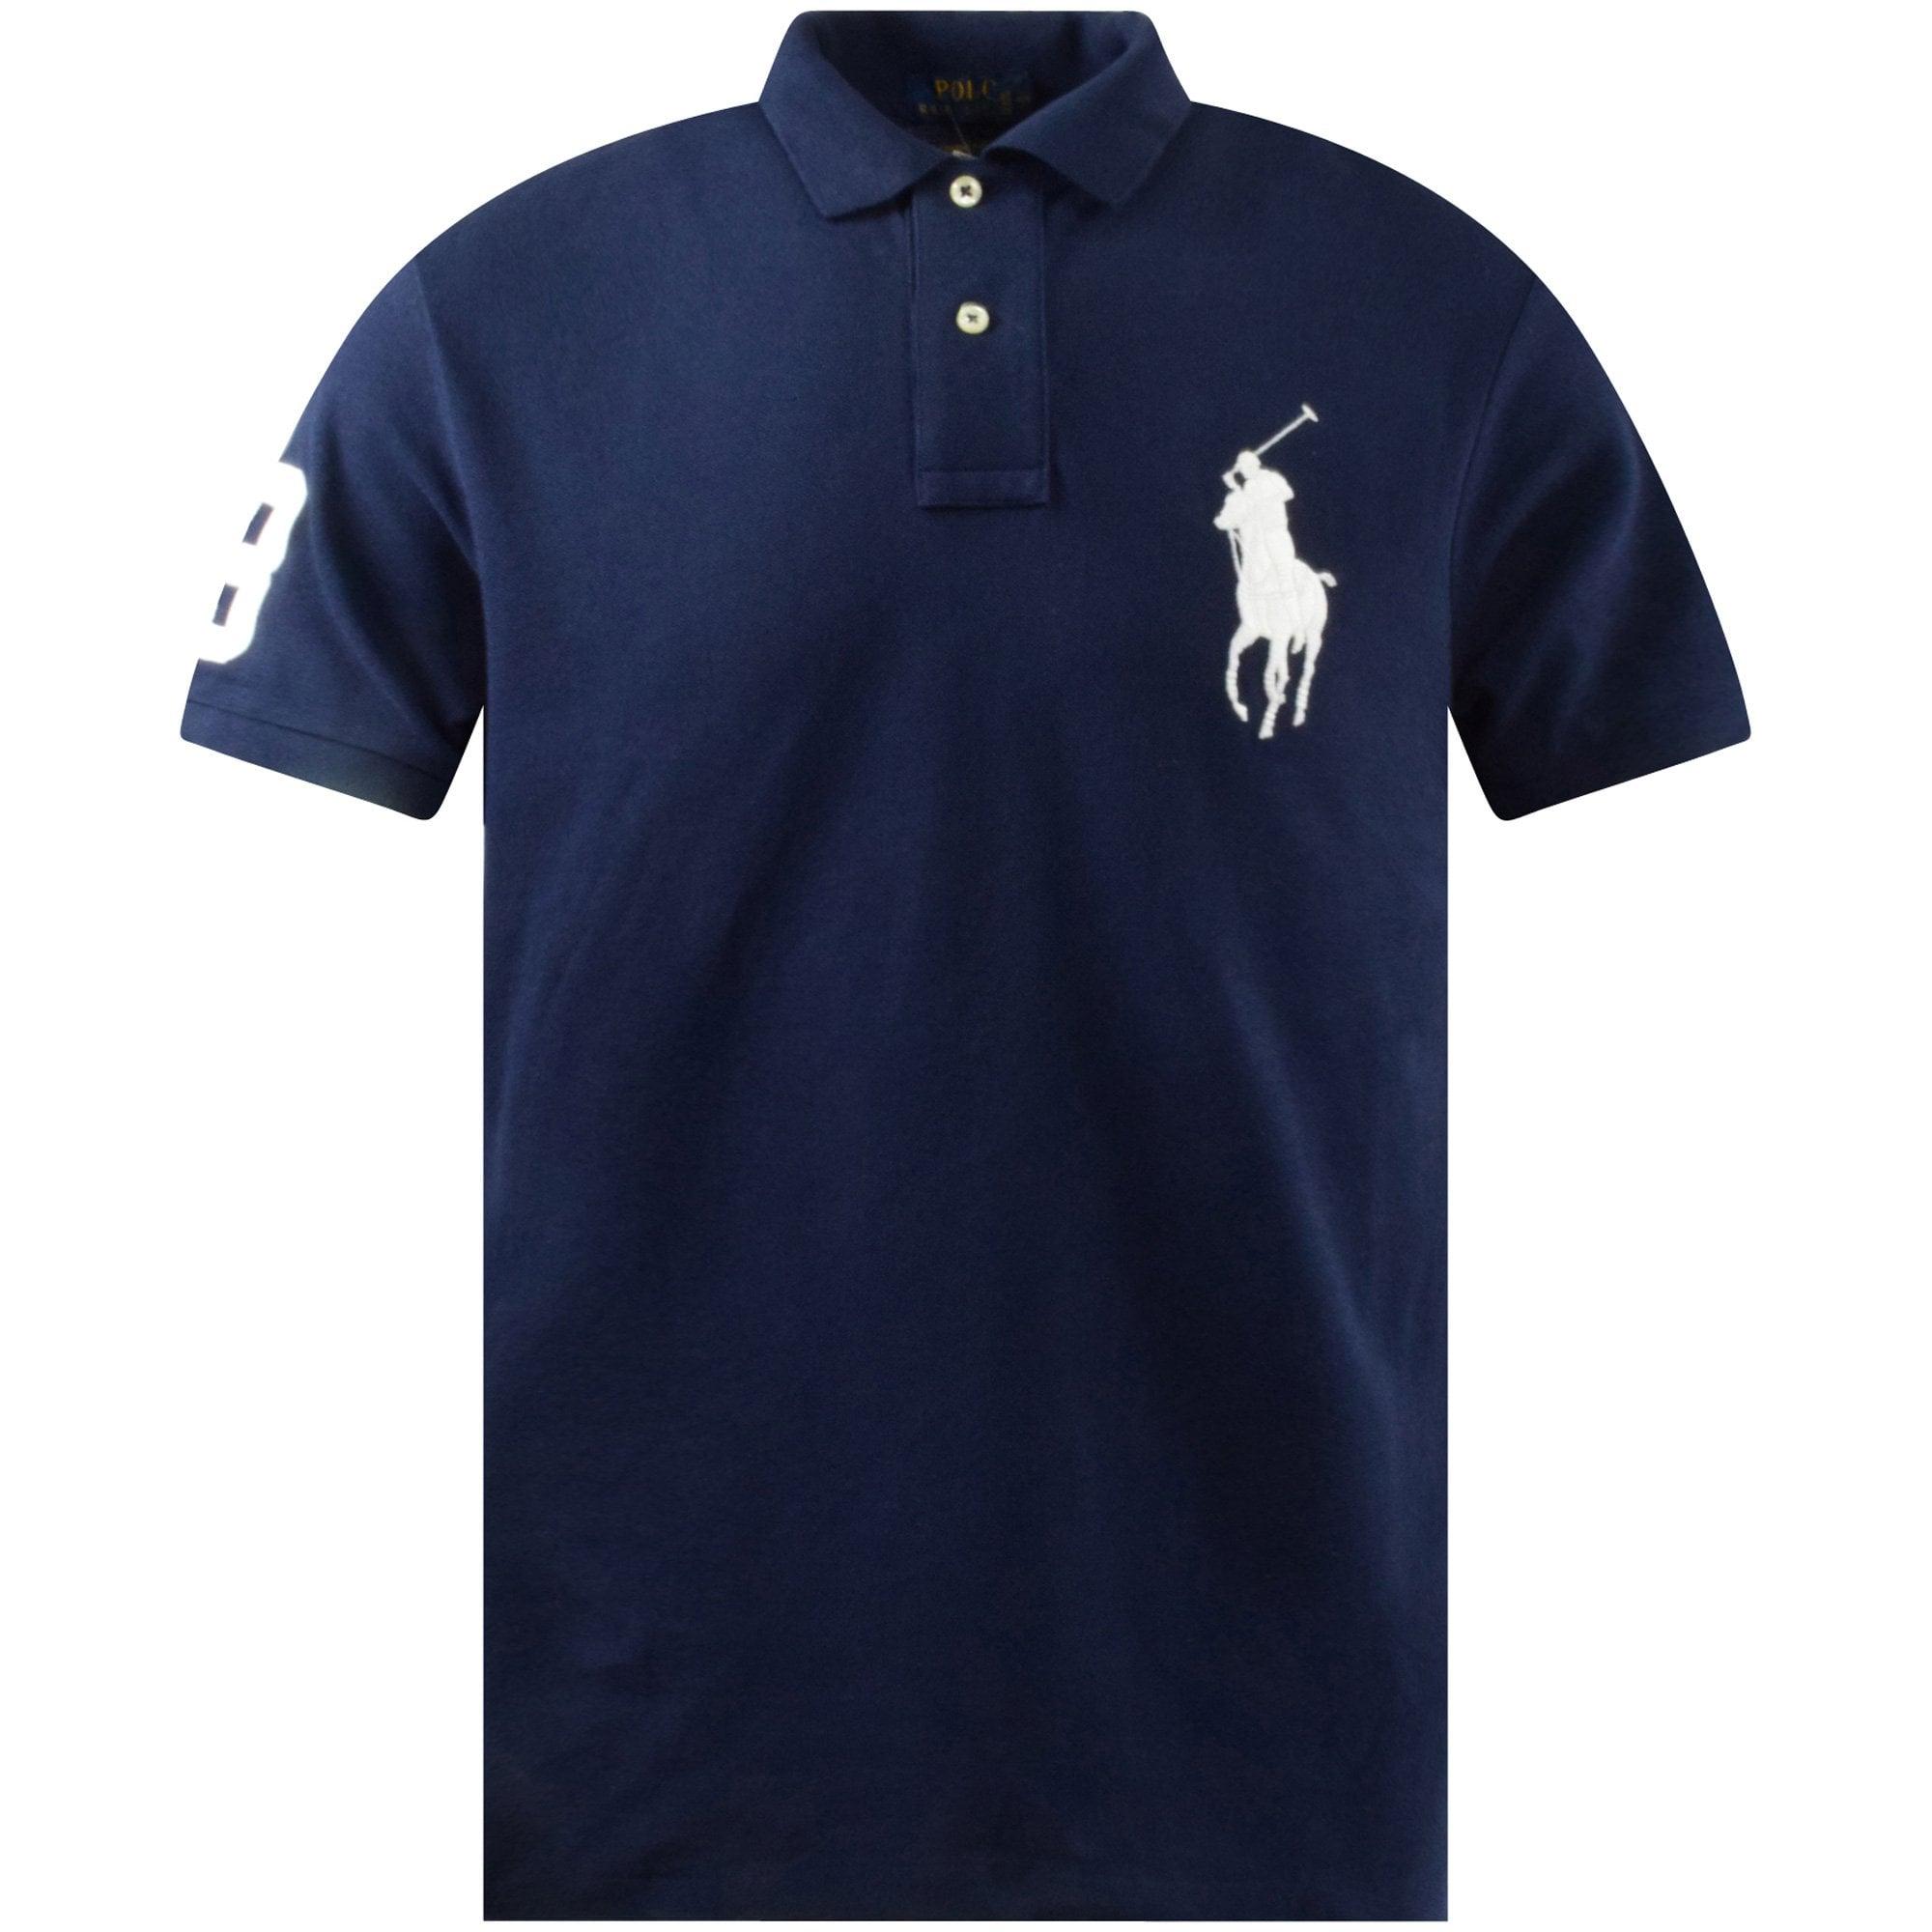 POLO RALPH LAUREN Navy Slim Big Pony Polo Shirt